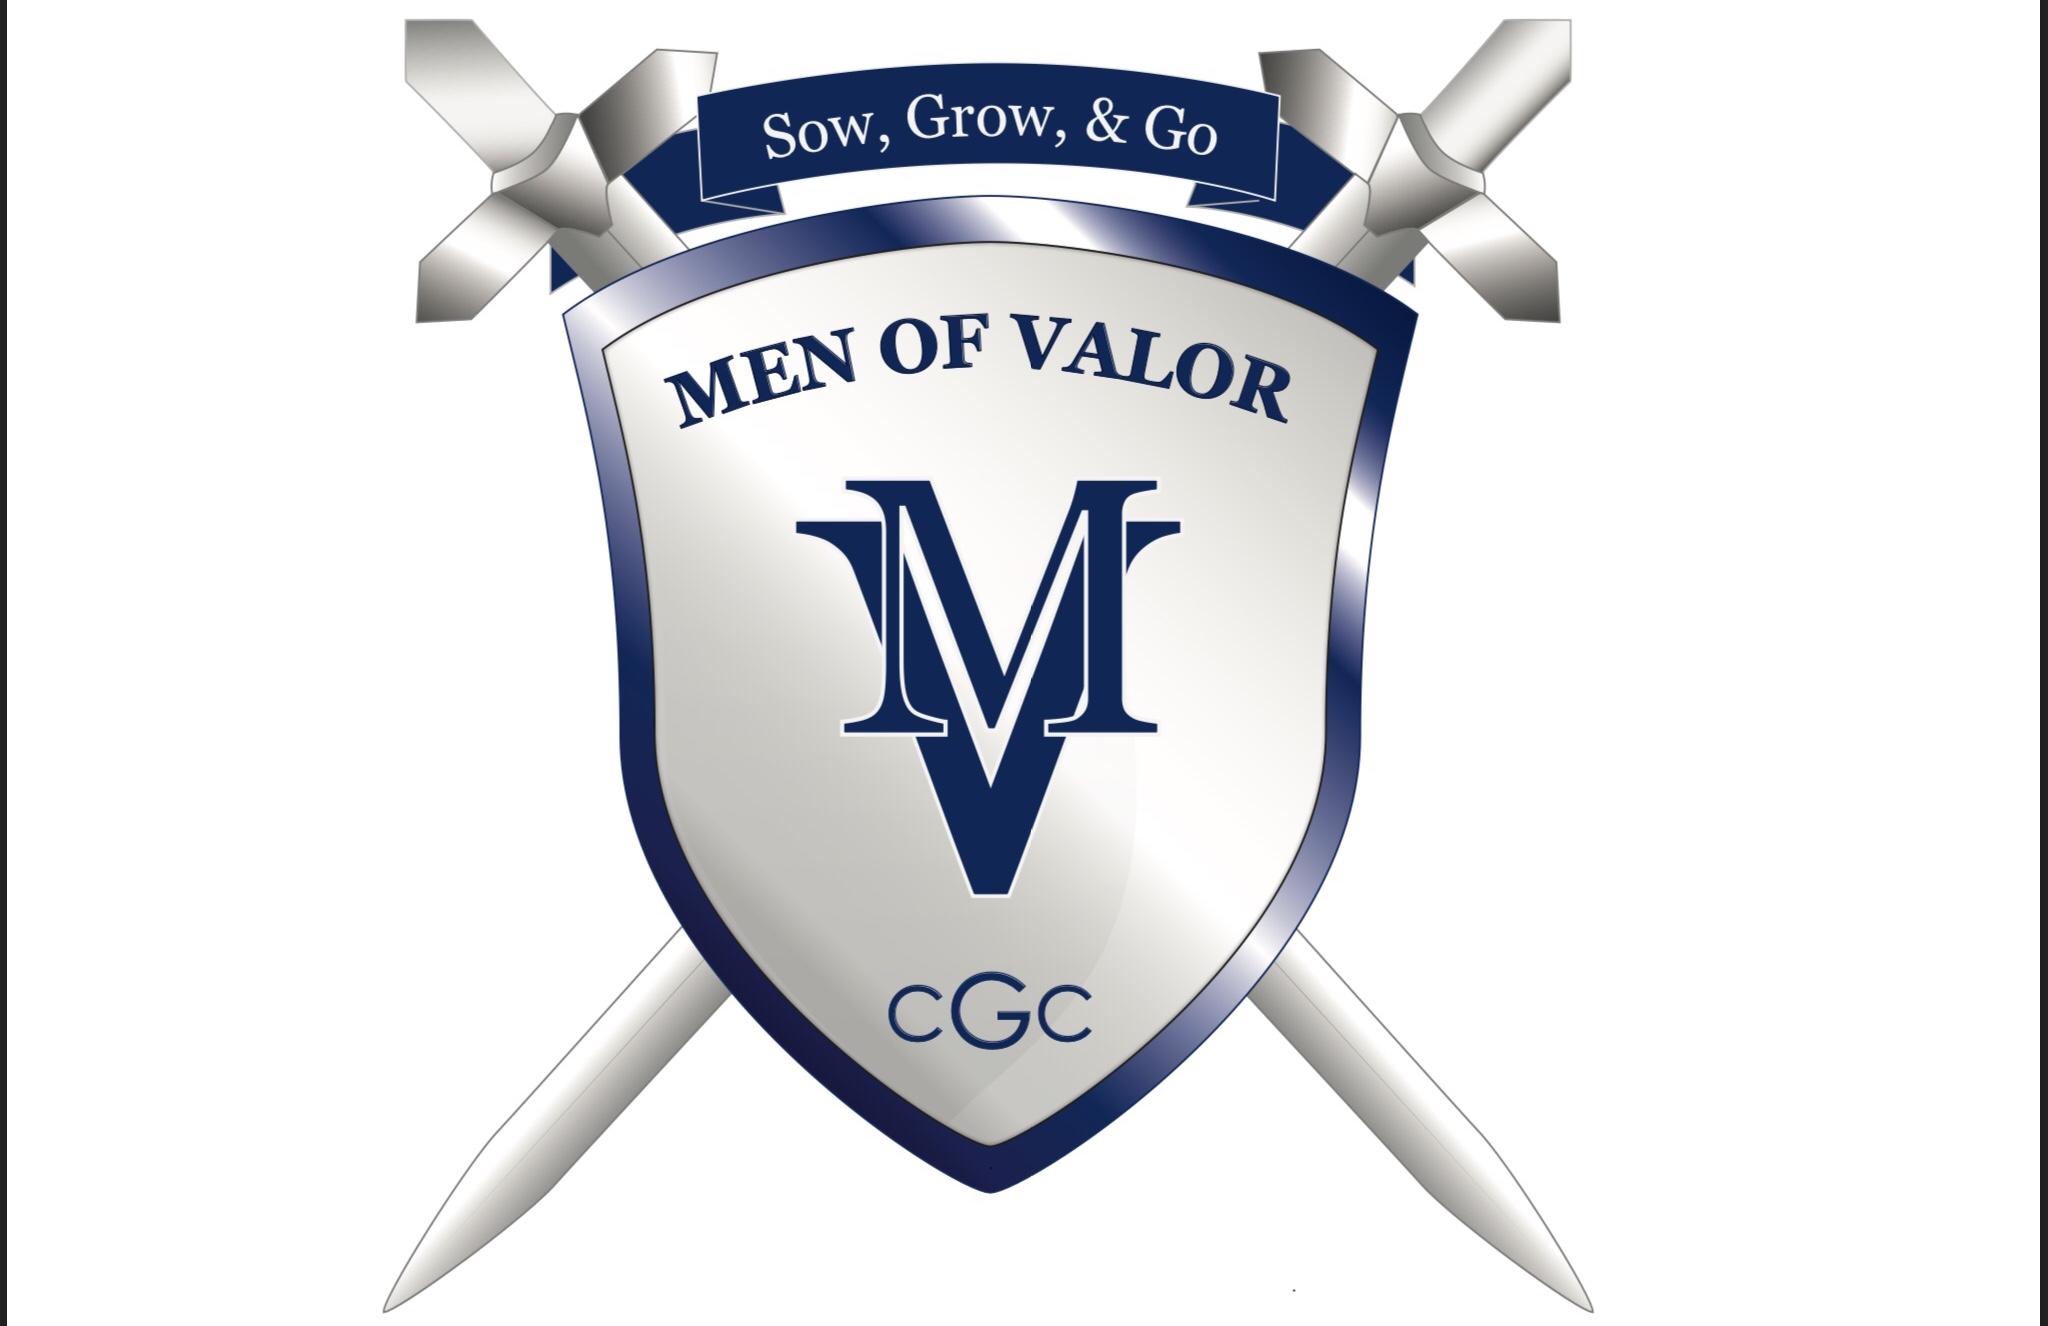 Mighty Men of Value